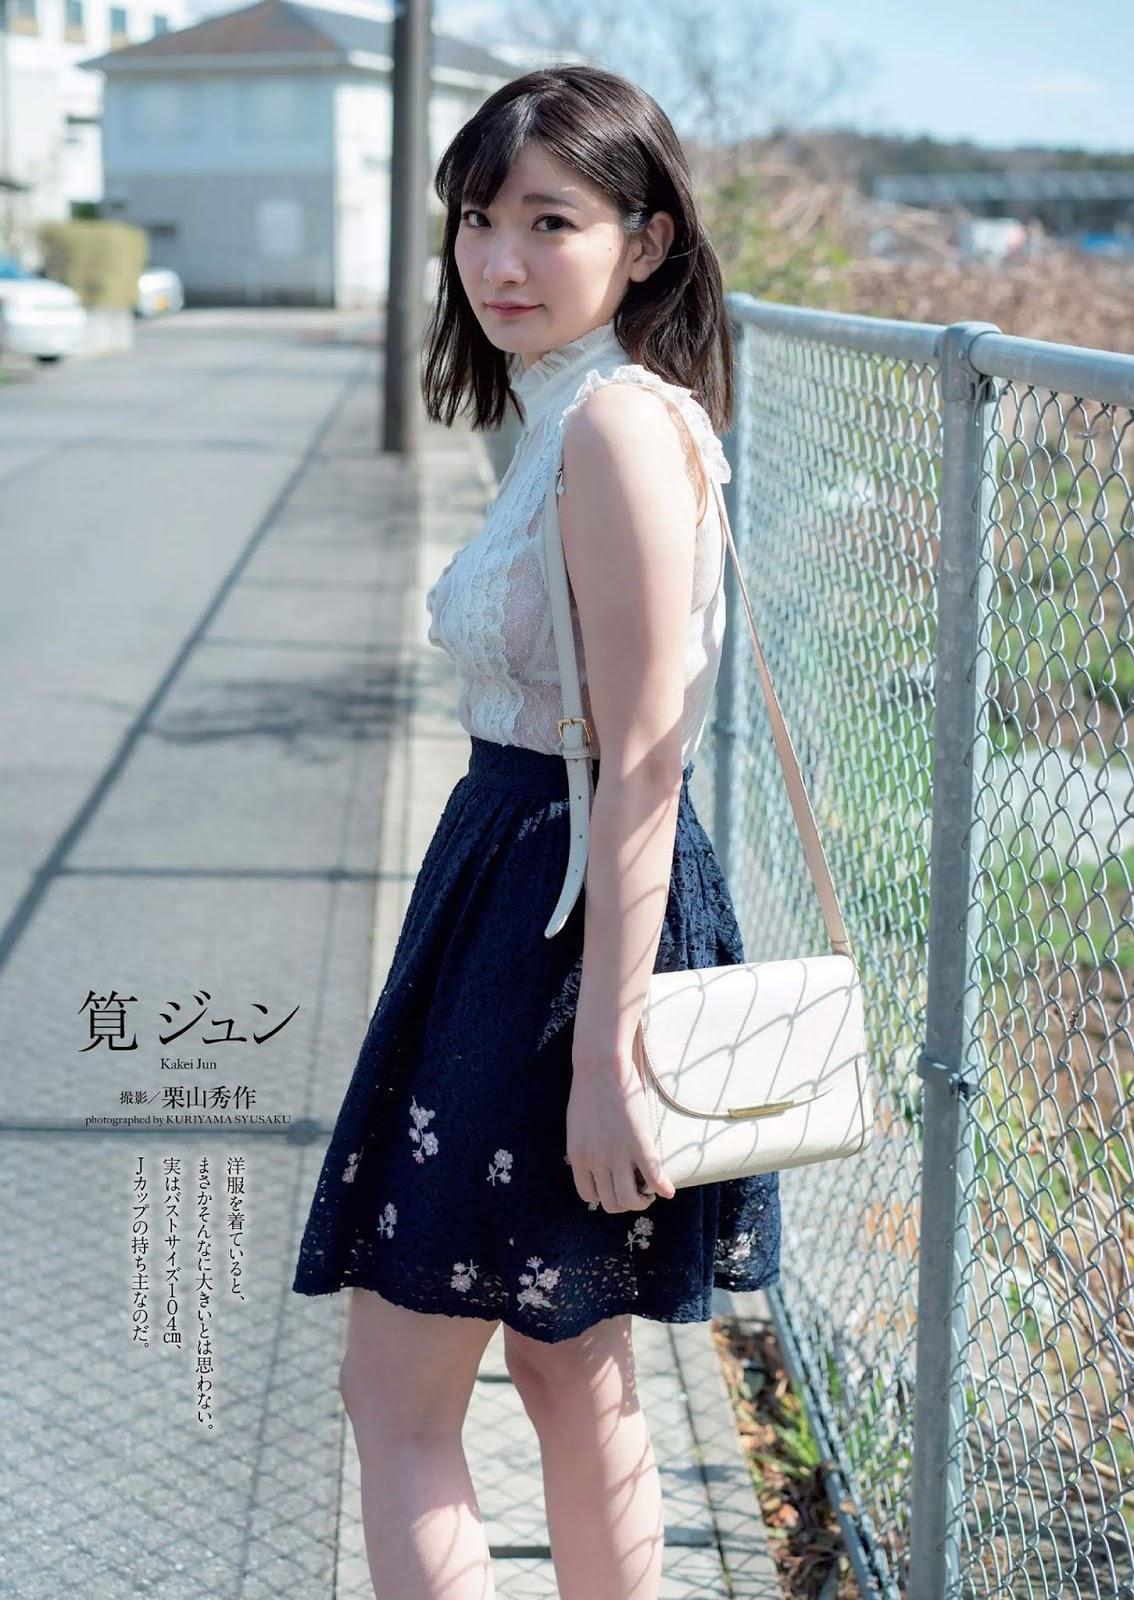 Jun Kakei 筧ジュン, Weekly Playboy 2019 No.29 (週刊プレイボーイ 2019年29號) - 亞洲美女 -